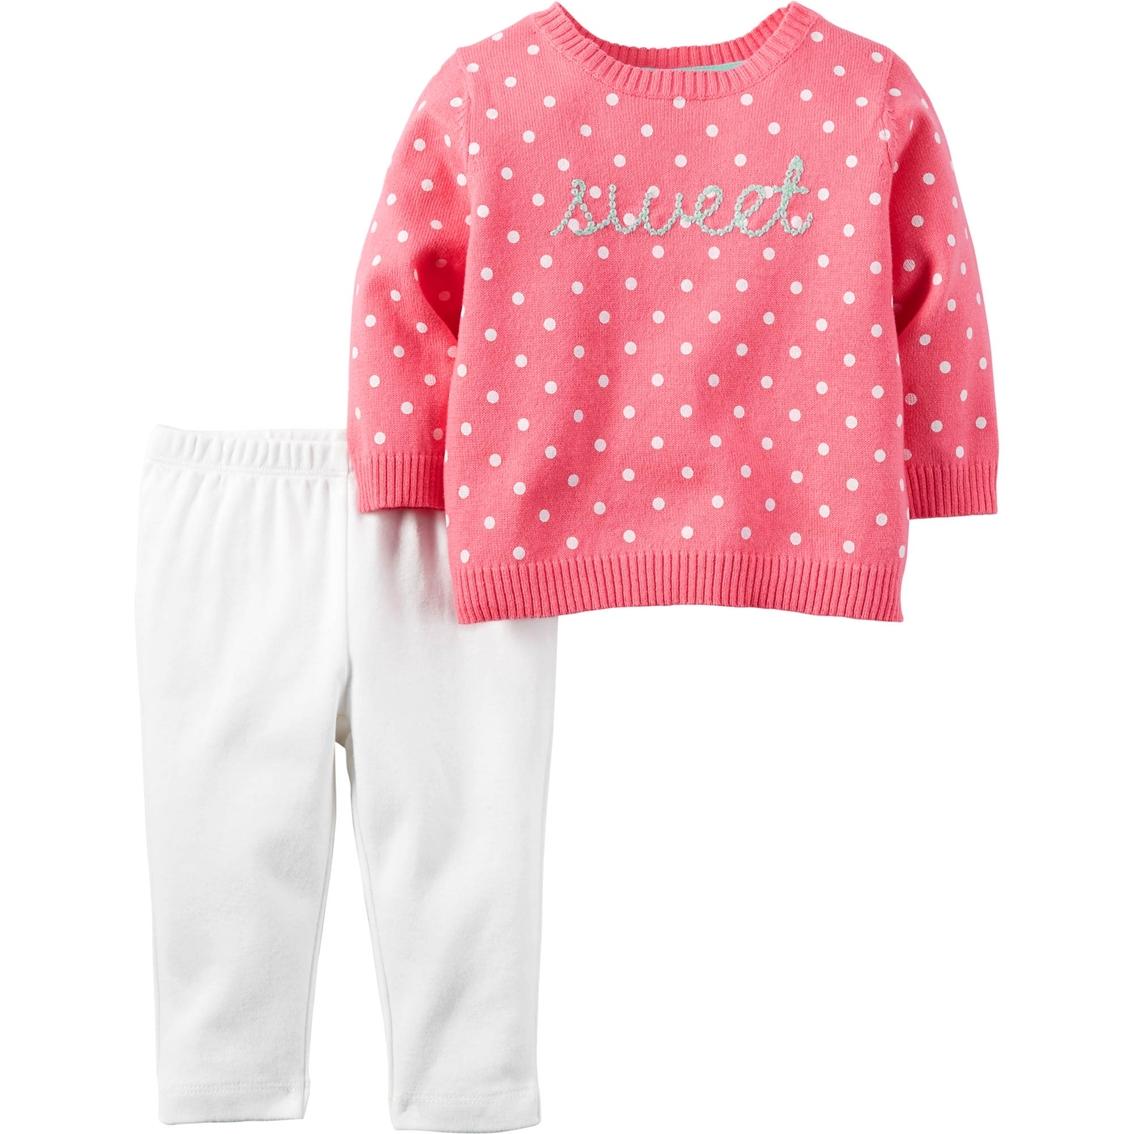 71df039c2 Carter s Infant Girls Sweater Sweet Pink Dot White Pants 2 Pc. Set ...